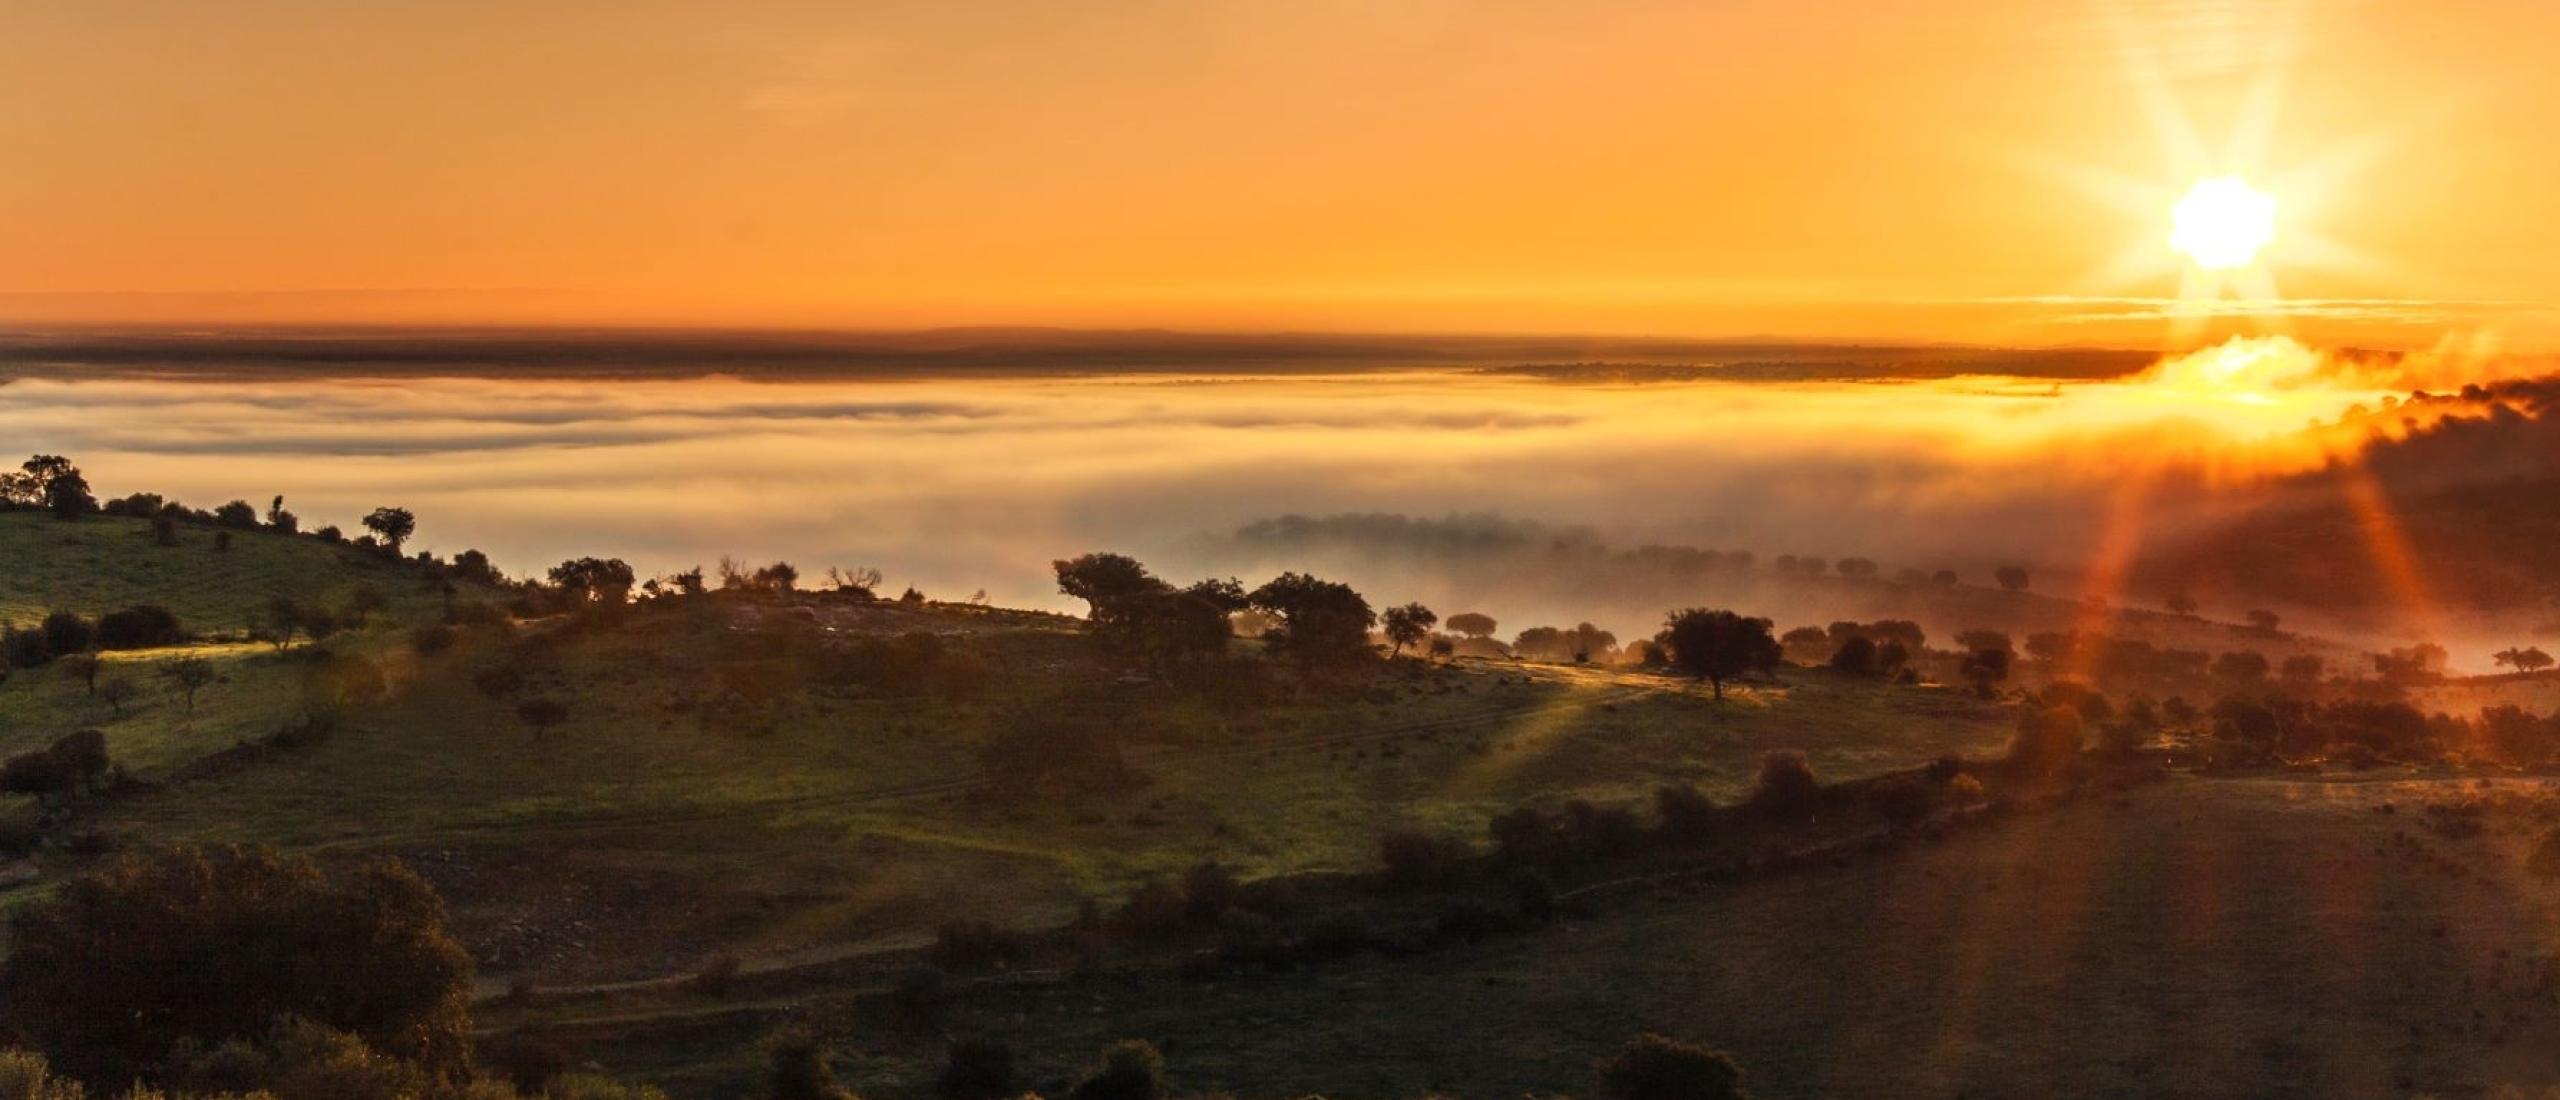 Beleef de Alentejo in midden Portugal